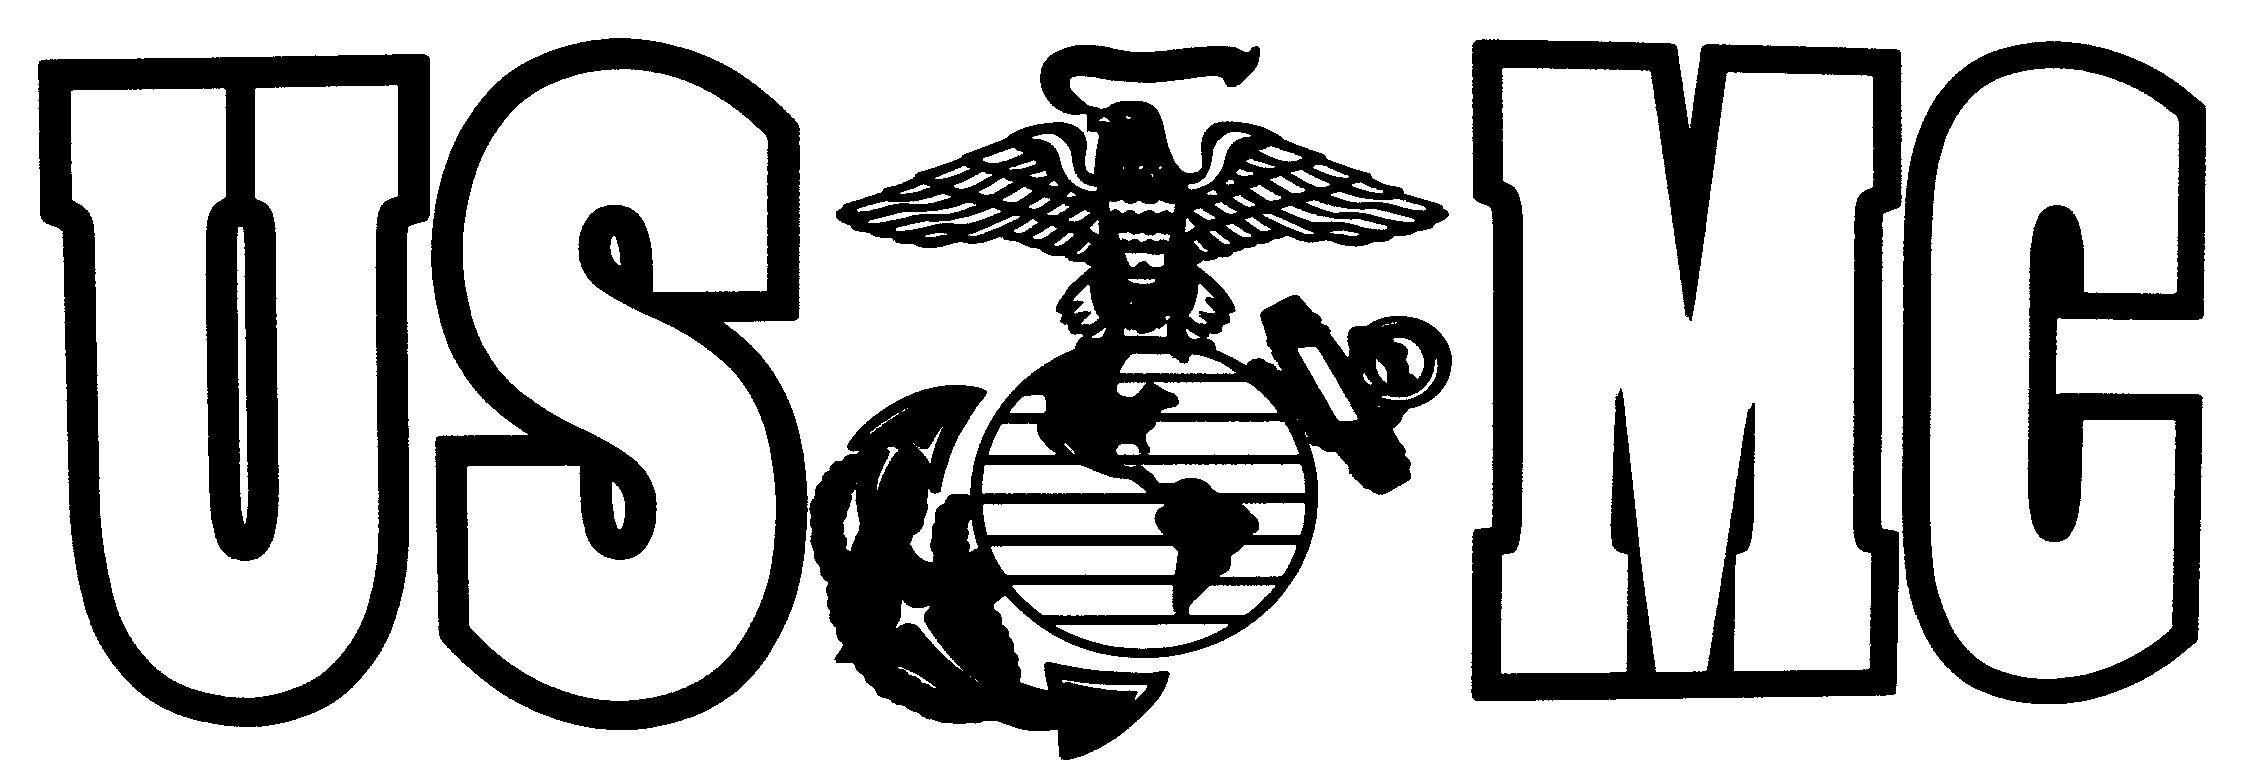 Marine Corps Usmc Eagle Globe And Anchor Decal